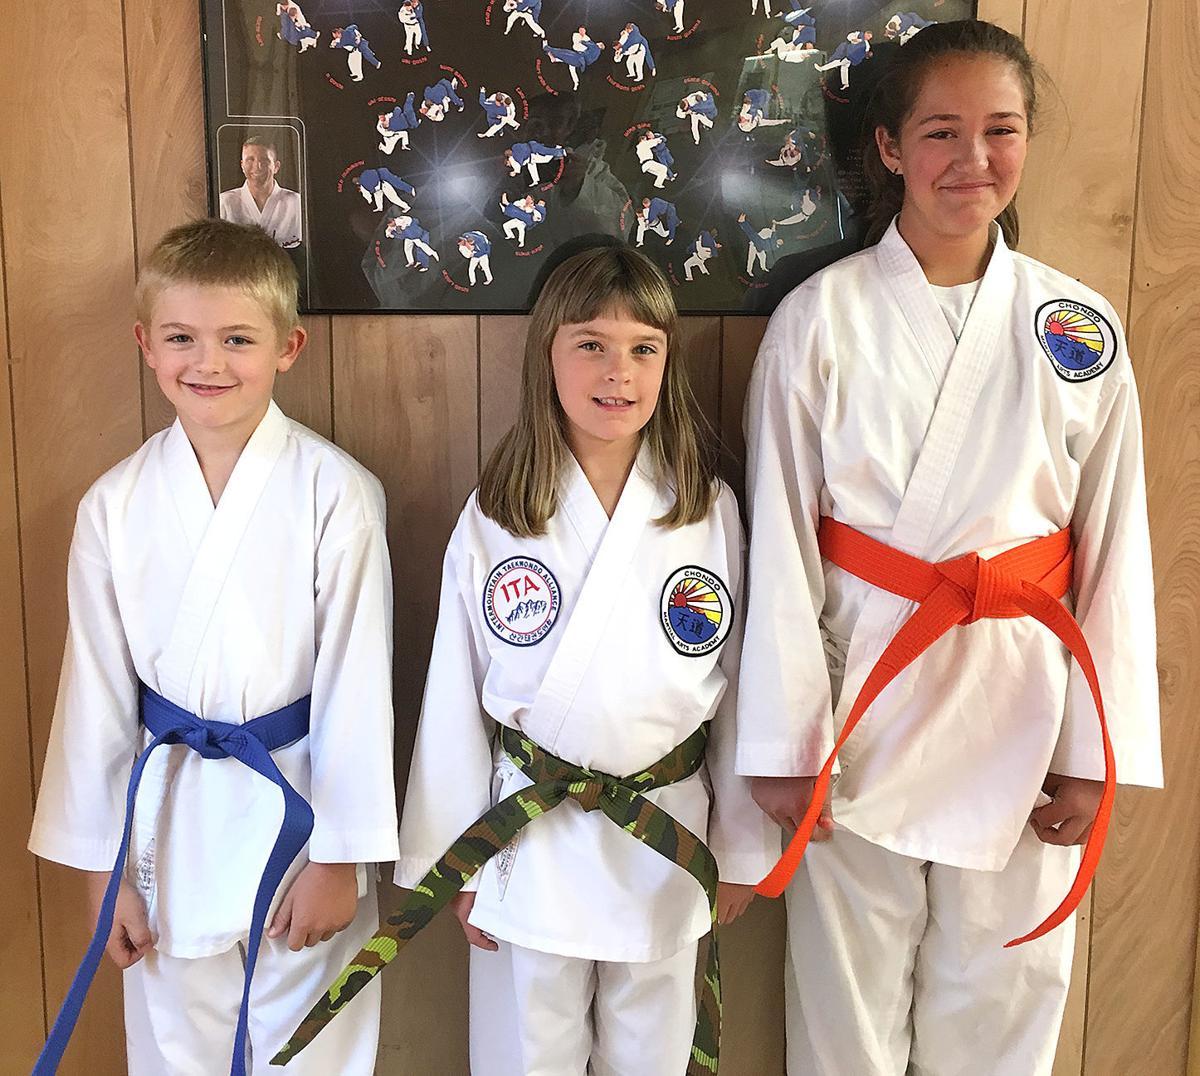 3 advance in martial arts